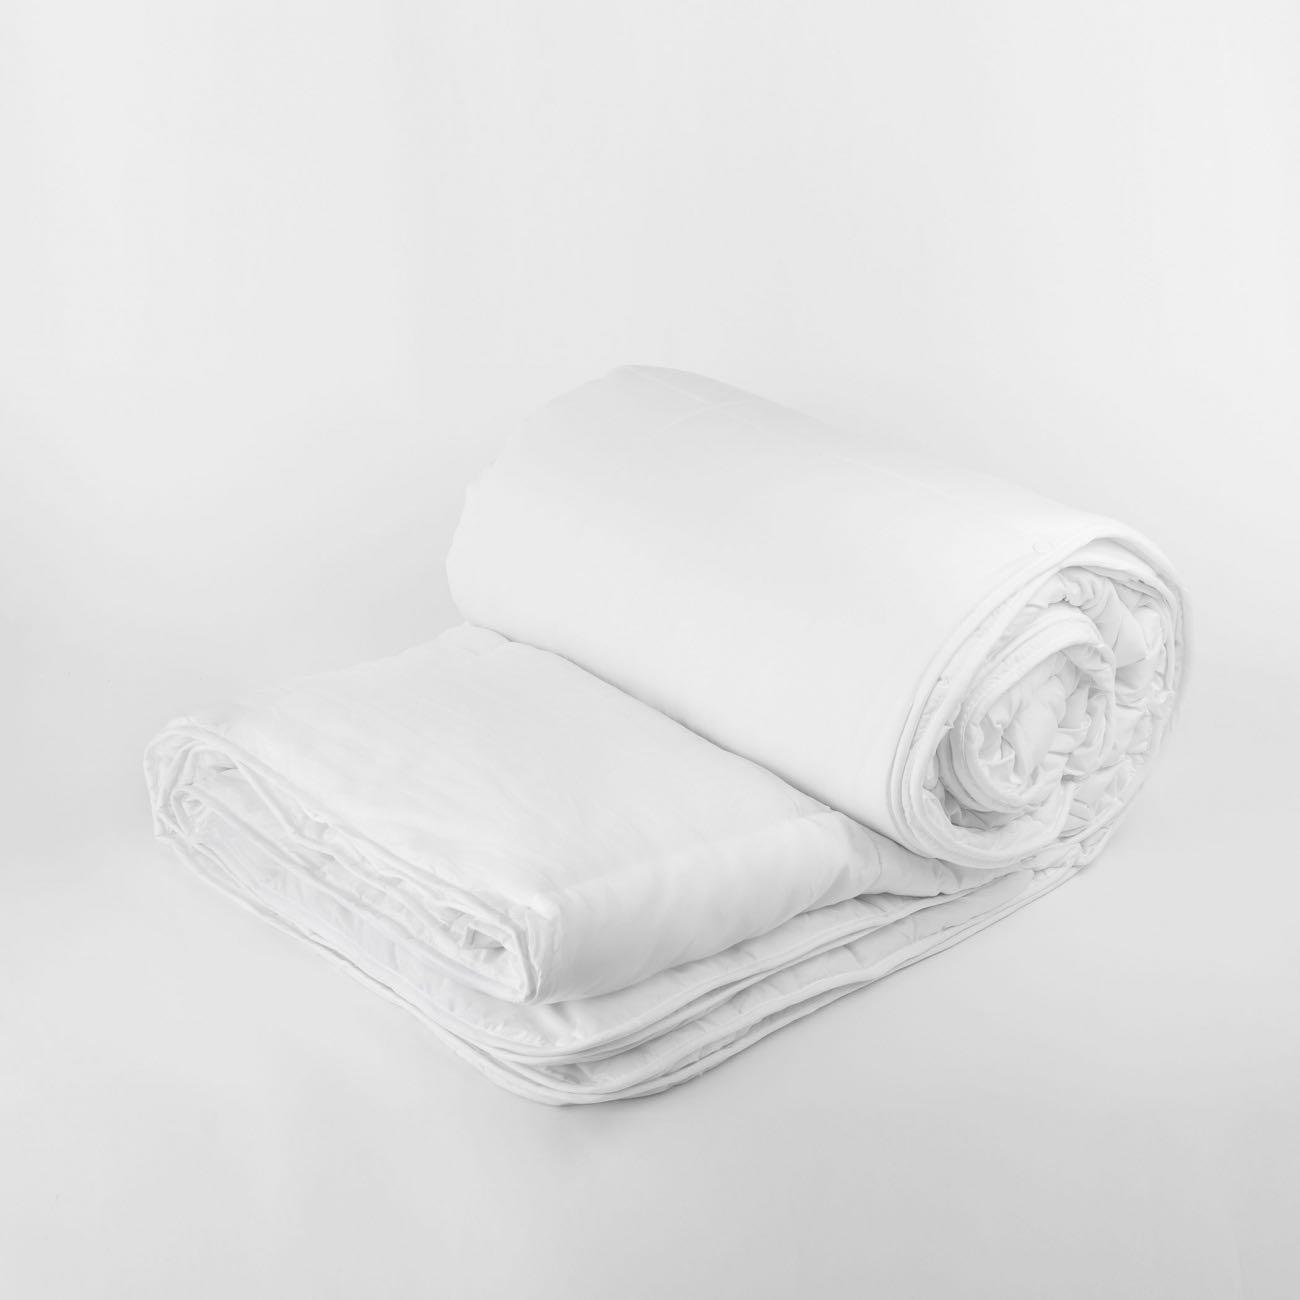 Enchimento Edredão Microfibra 4 Seasons (200+300 g/m2) Branco Catherine Lansfield